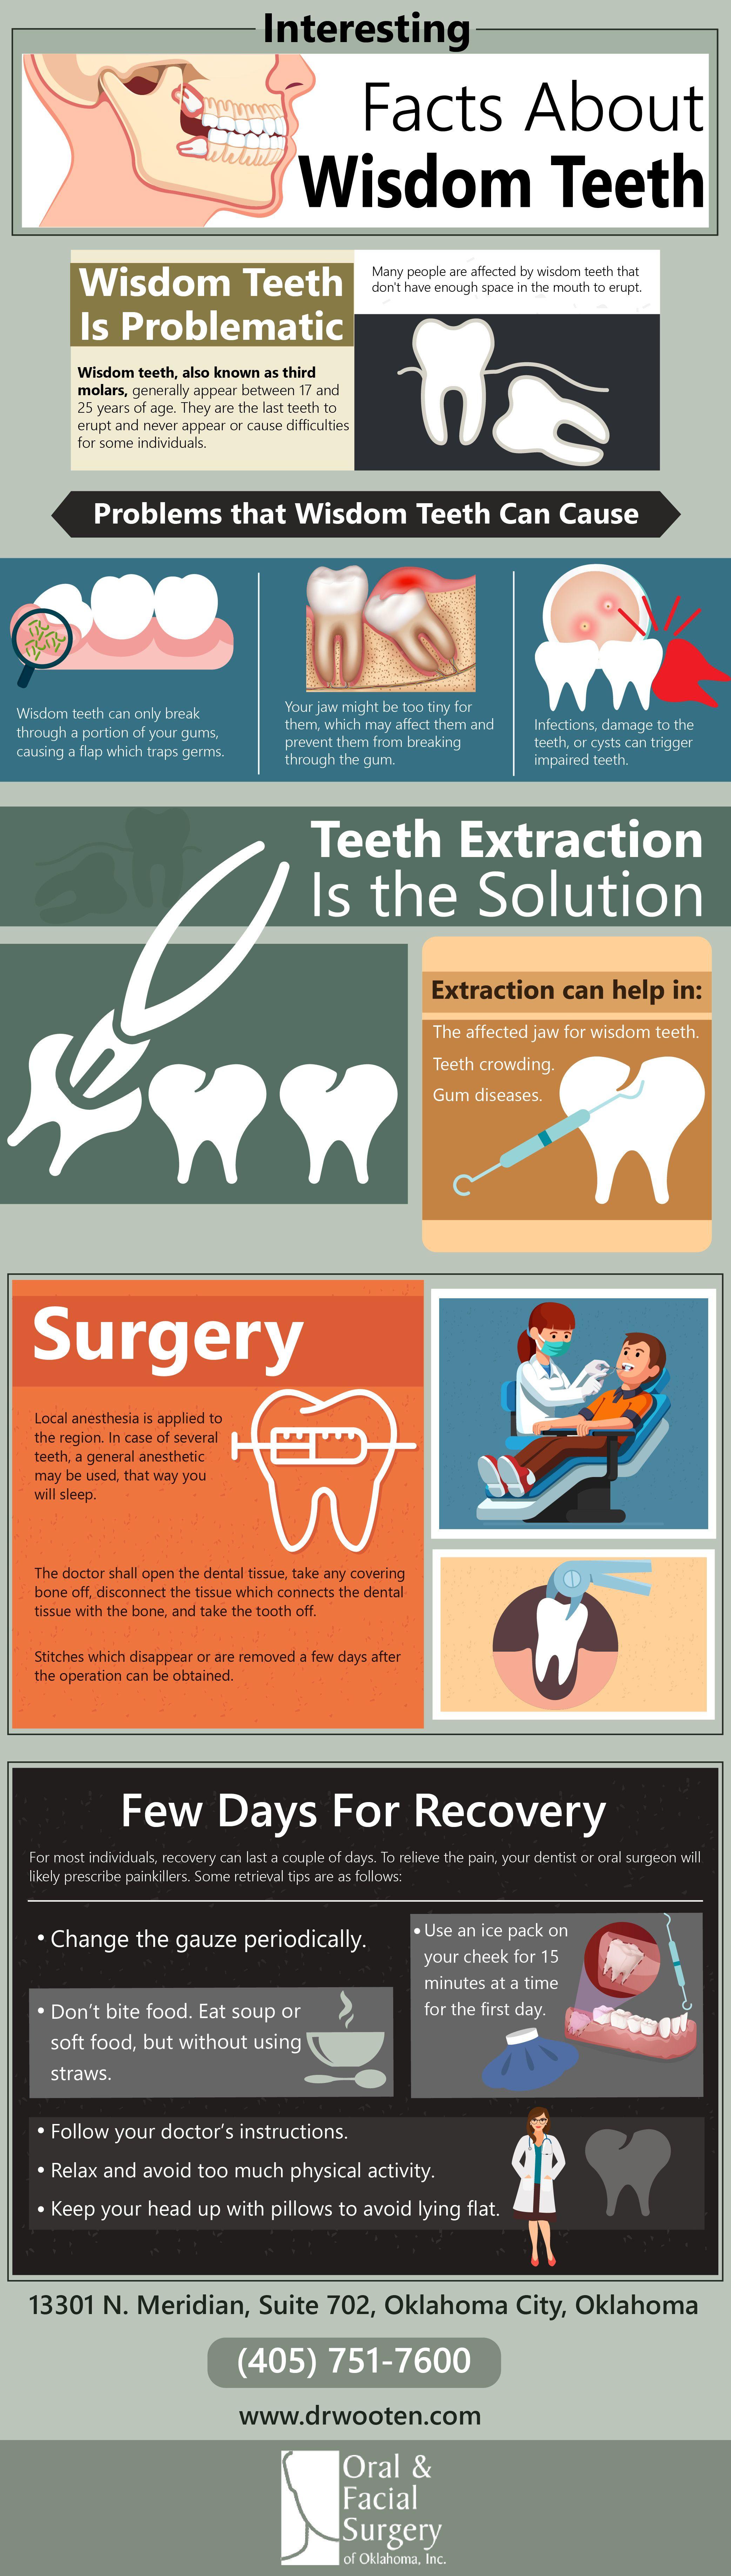 Interesting Facts About Wisdom Teeth Wisdom teeth